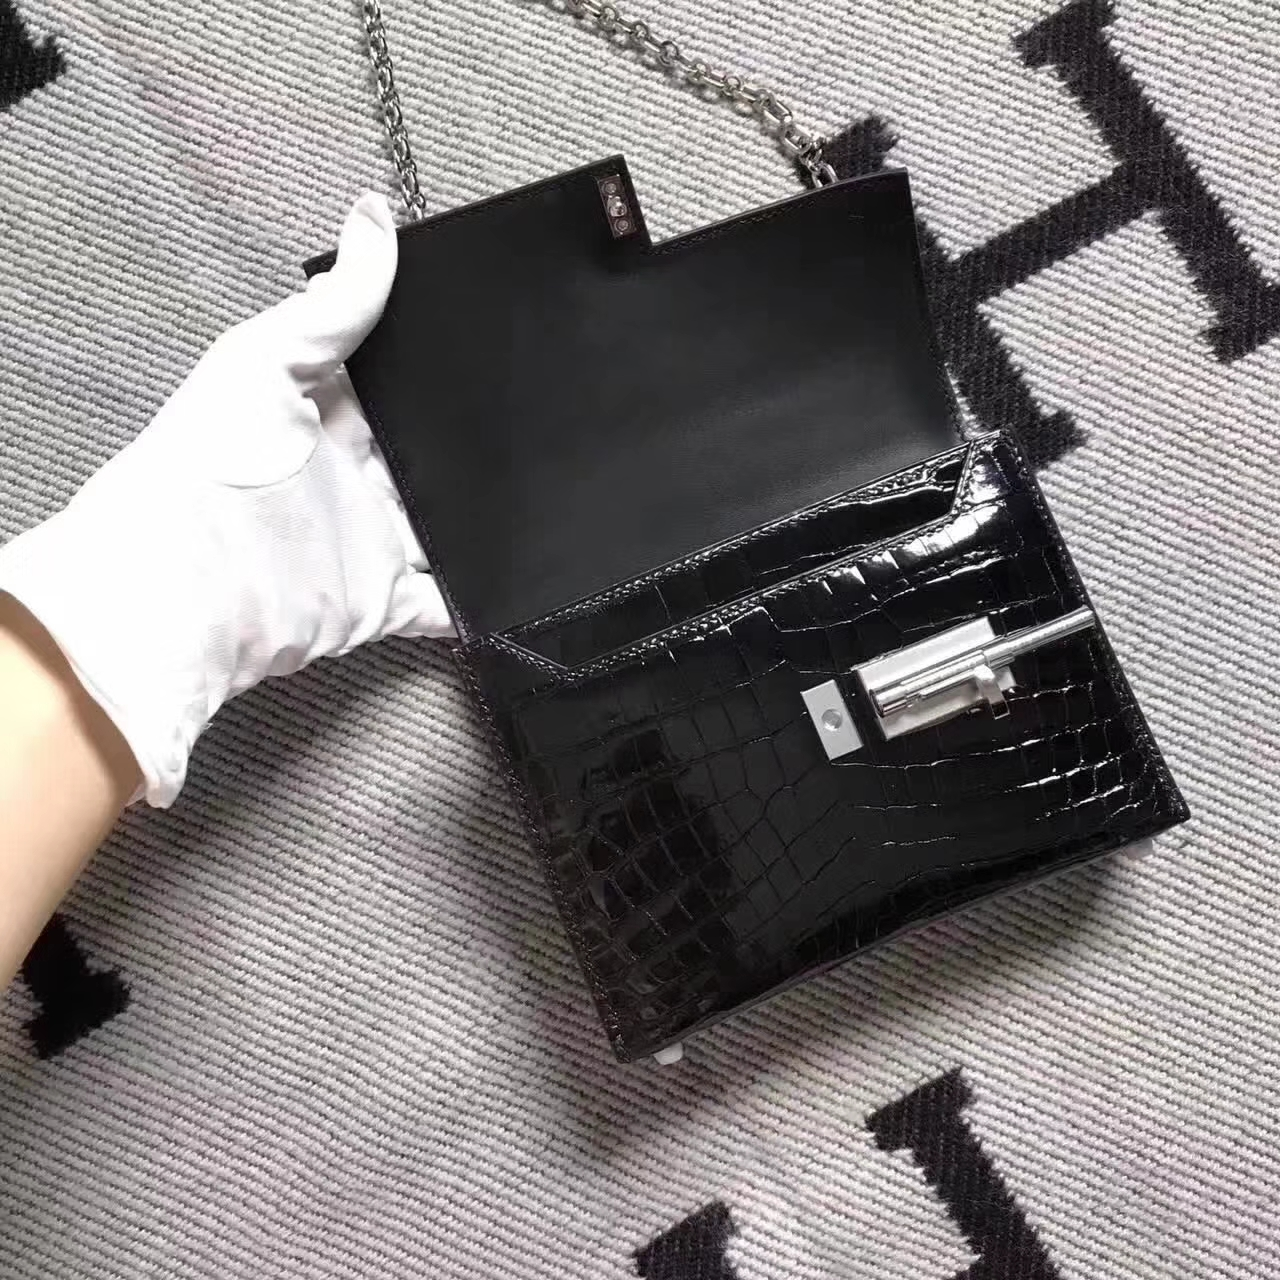 New Arrival Hermes Black Crocodile Shiny VerrouChain Shoulder Bag Small Size